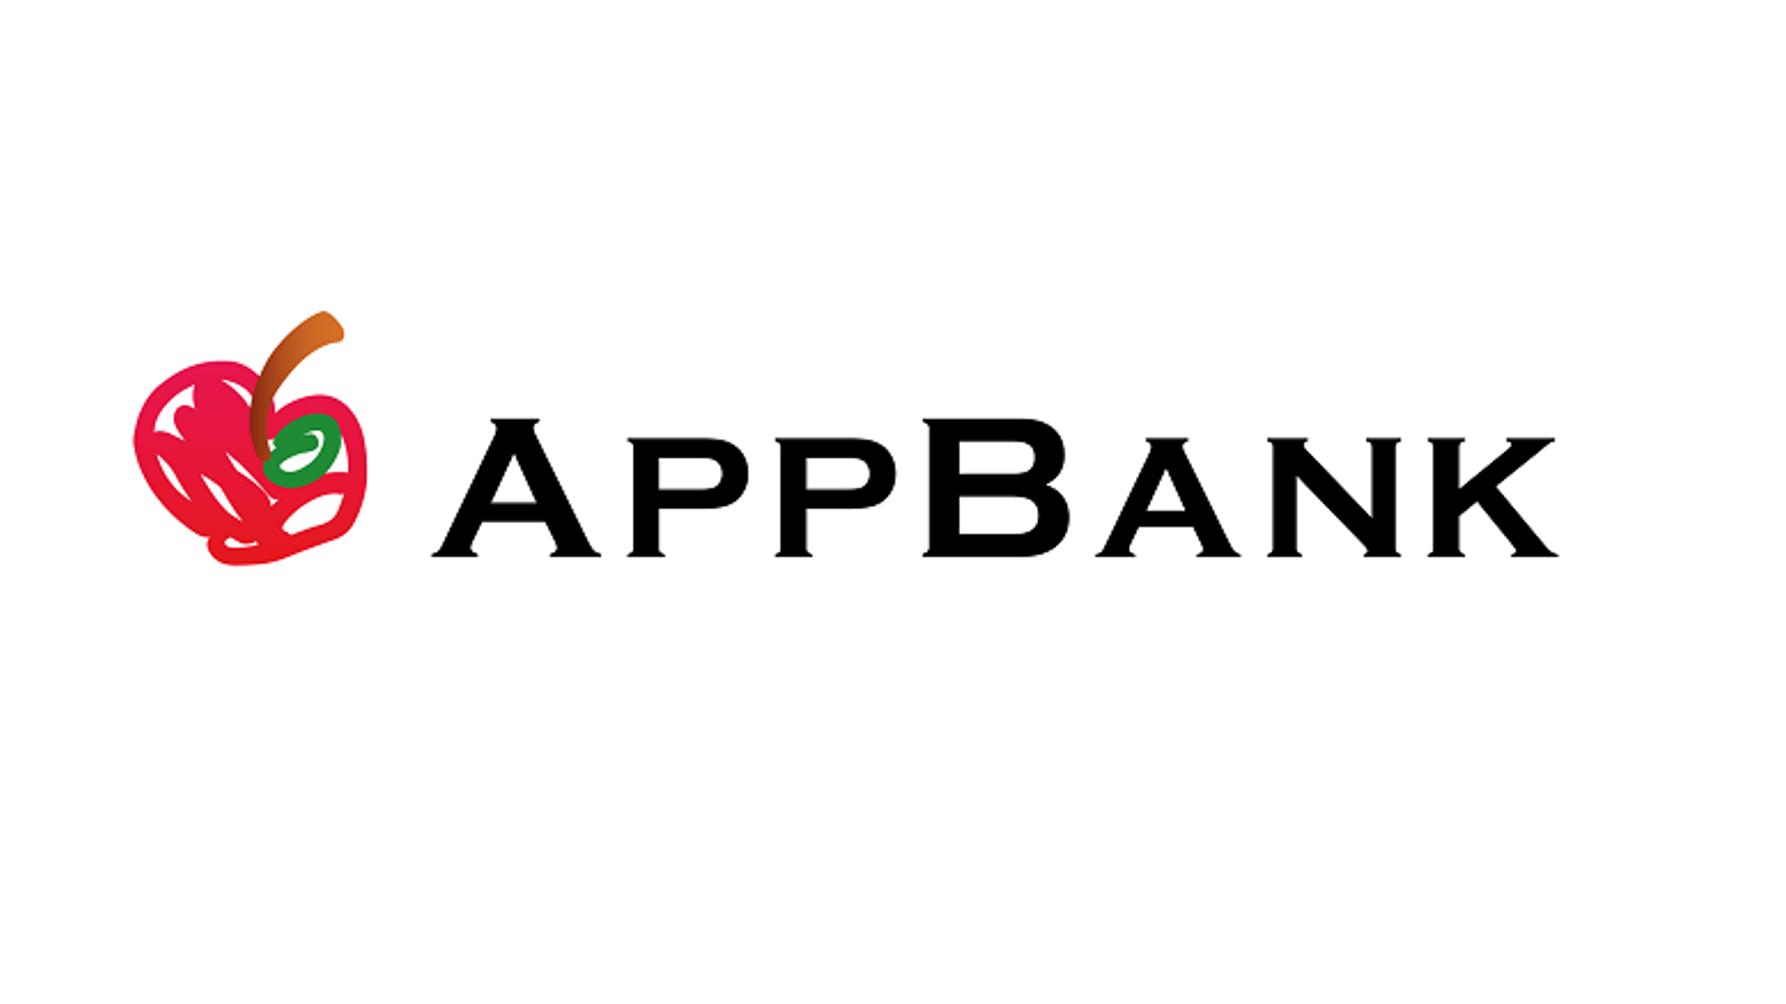 AppBank株式会社の決算/売上/経常利益を調べ、IR情報を徹底調査